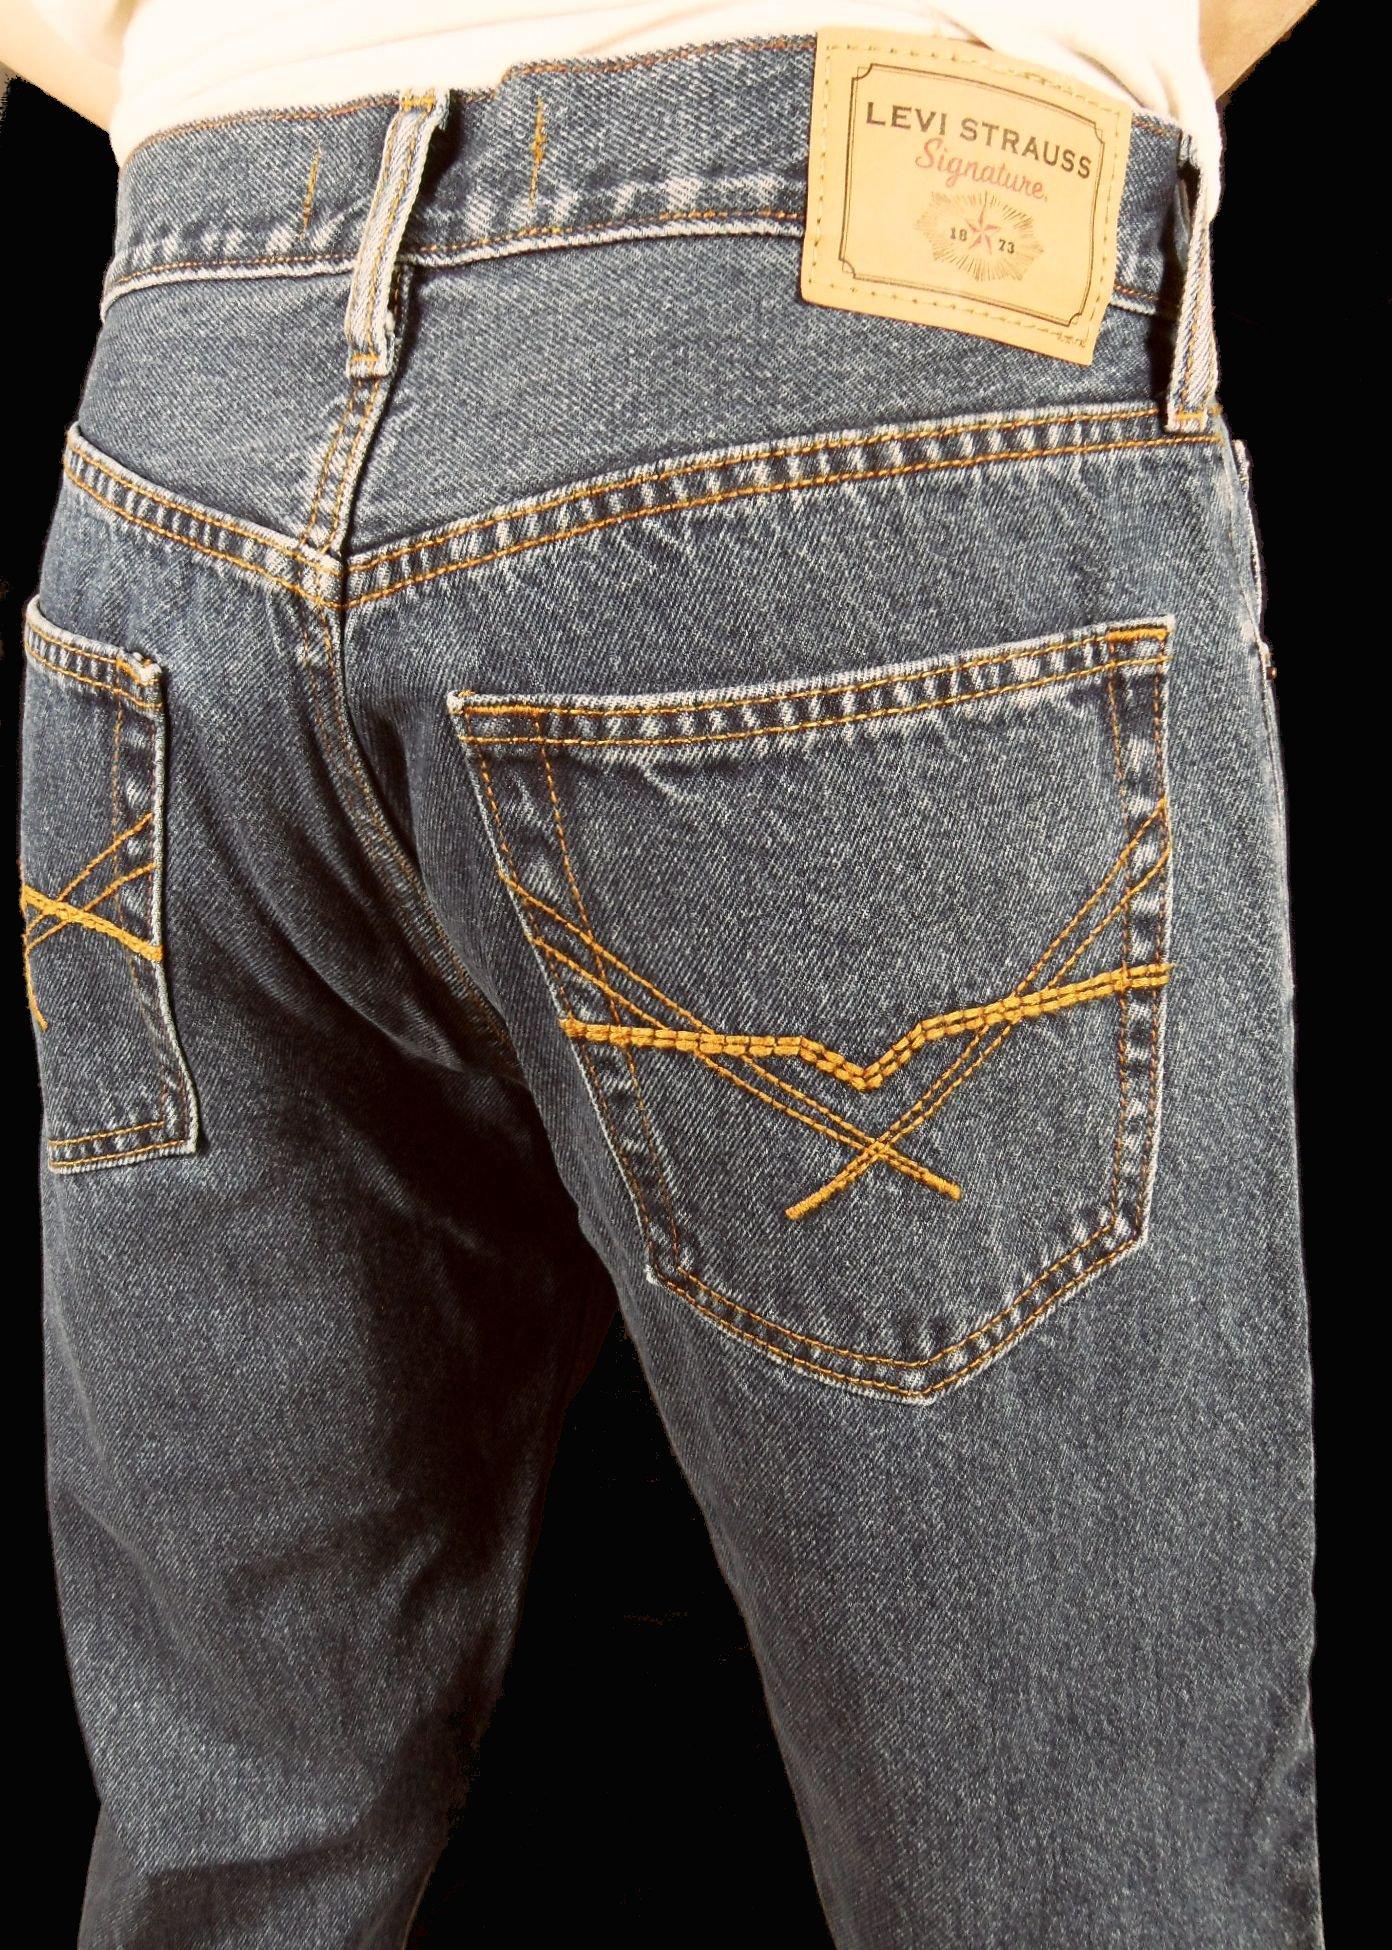 Levi strauss jeans wikipedia